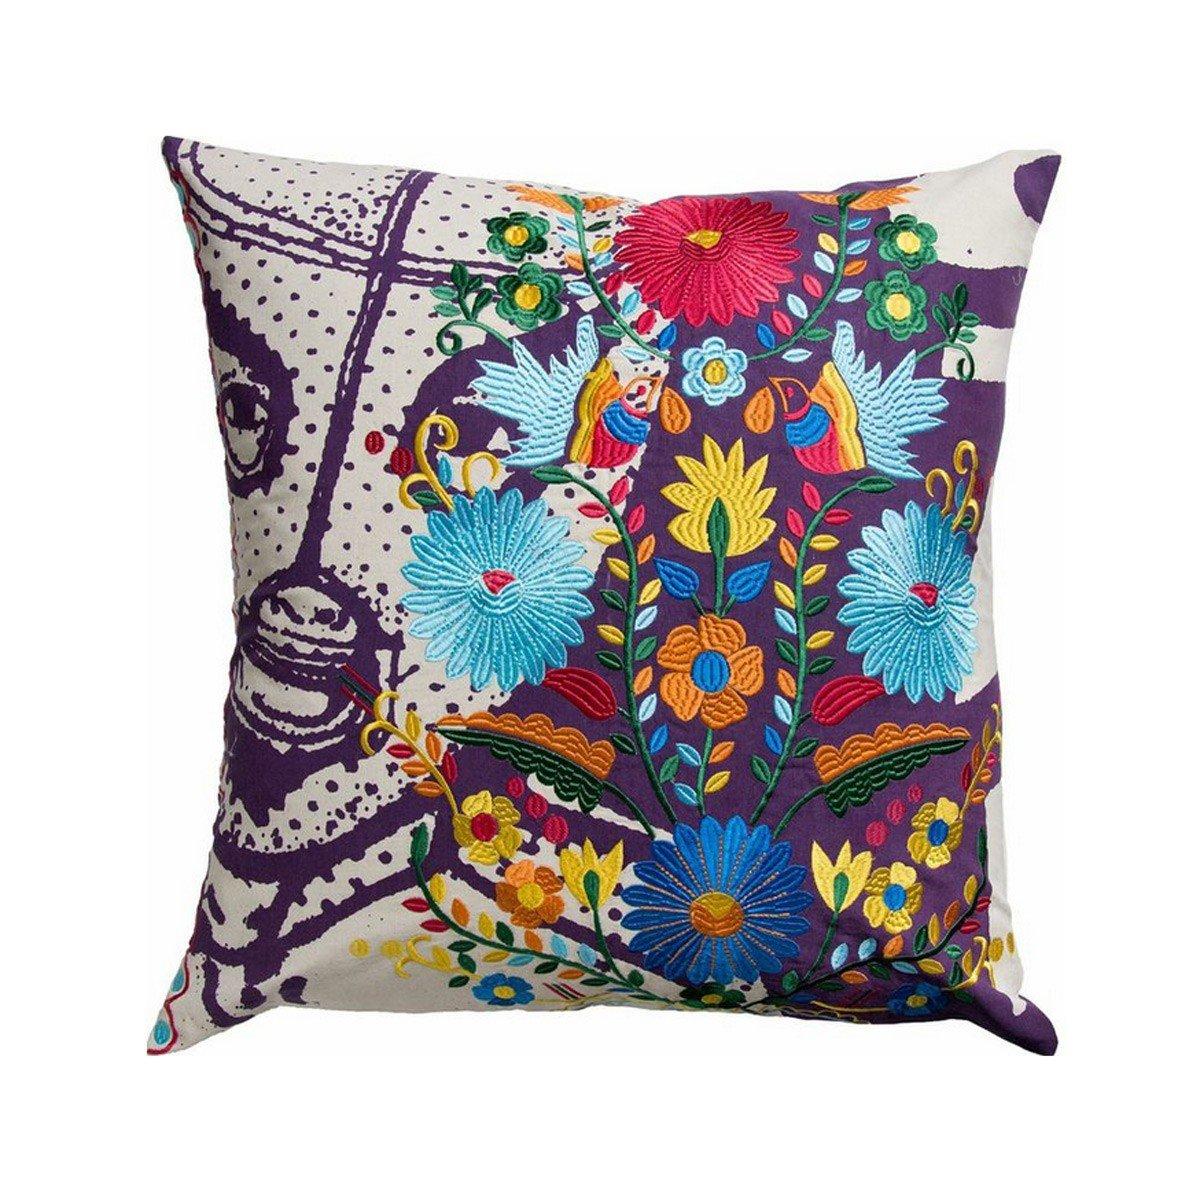 KOKOメキシコEl Santo印刷と刺繍コットン枕、26 by 26-inch、マルチカラー。   B00BG7EIFO